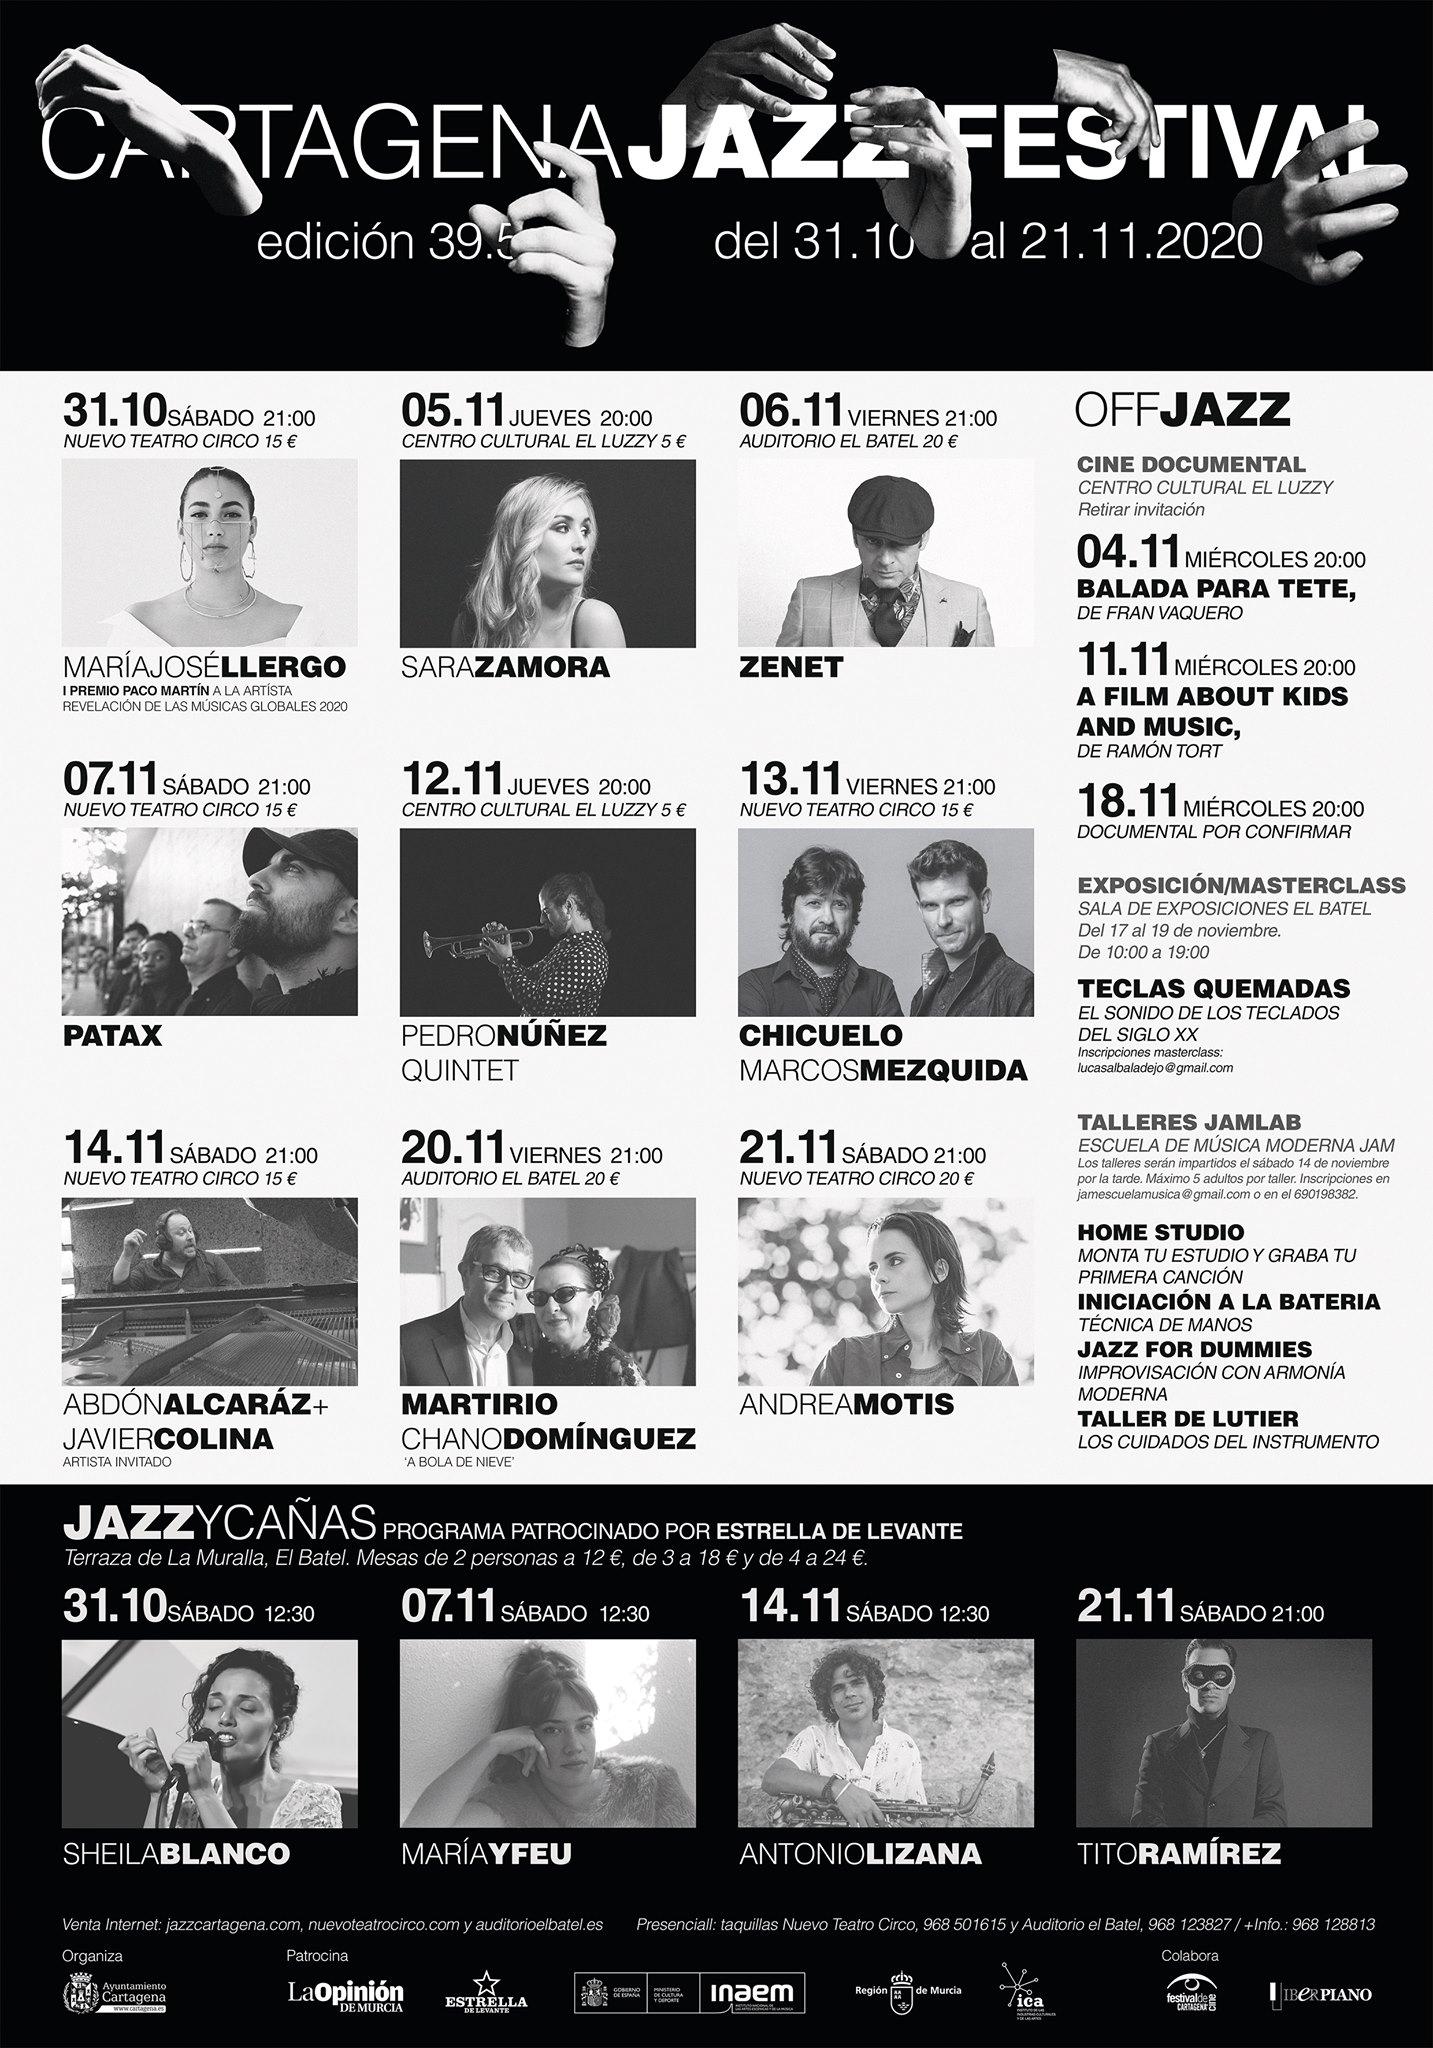 carrtagena-jazz-festival.jpg